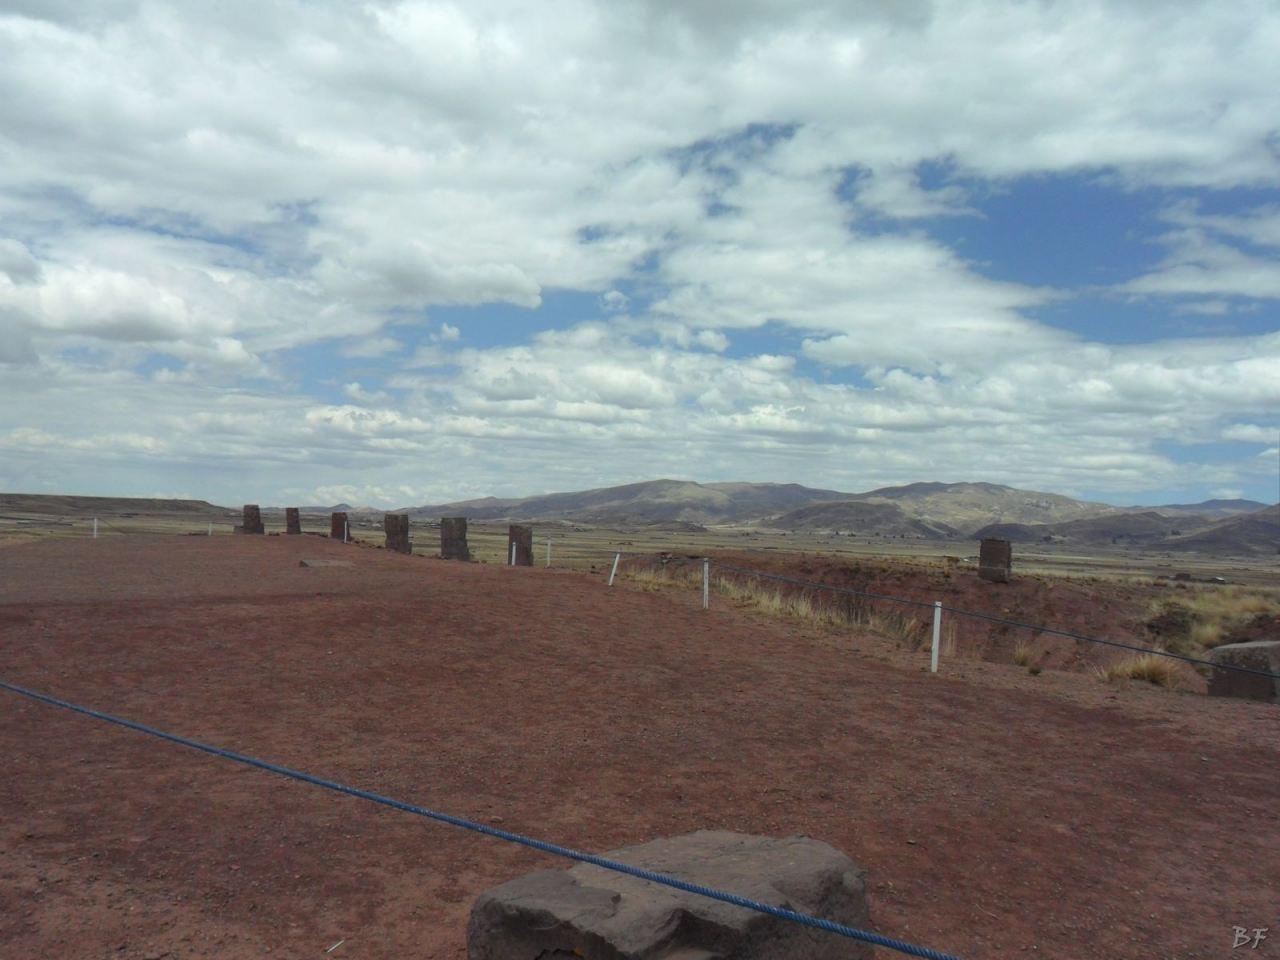 Sito-Megalitico-Piramide-Akapana-Kalasasaya-Menhir-Tiahuanaco-Bolivia-123